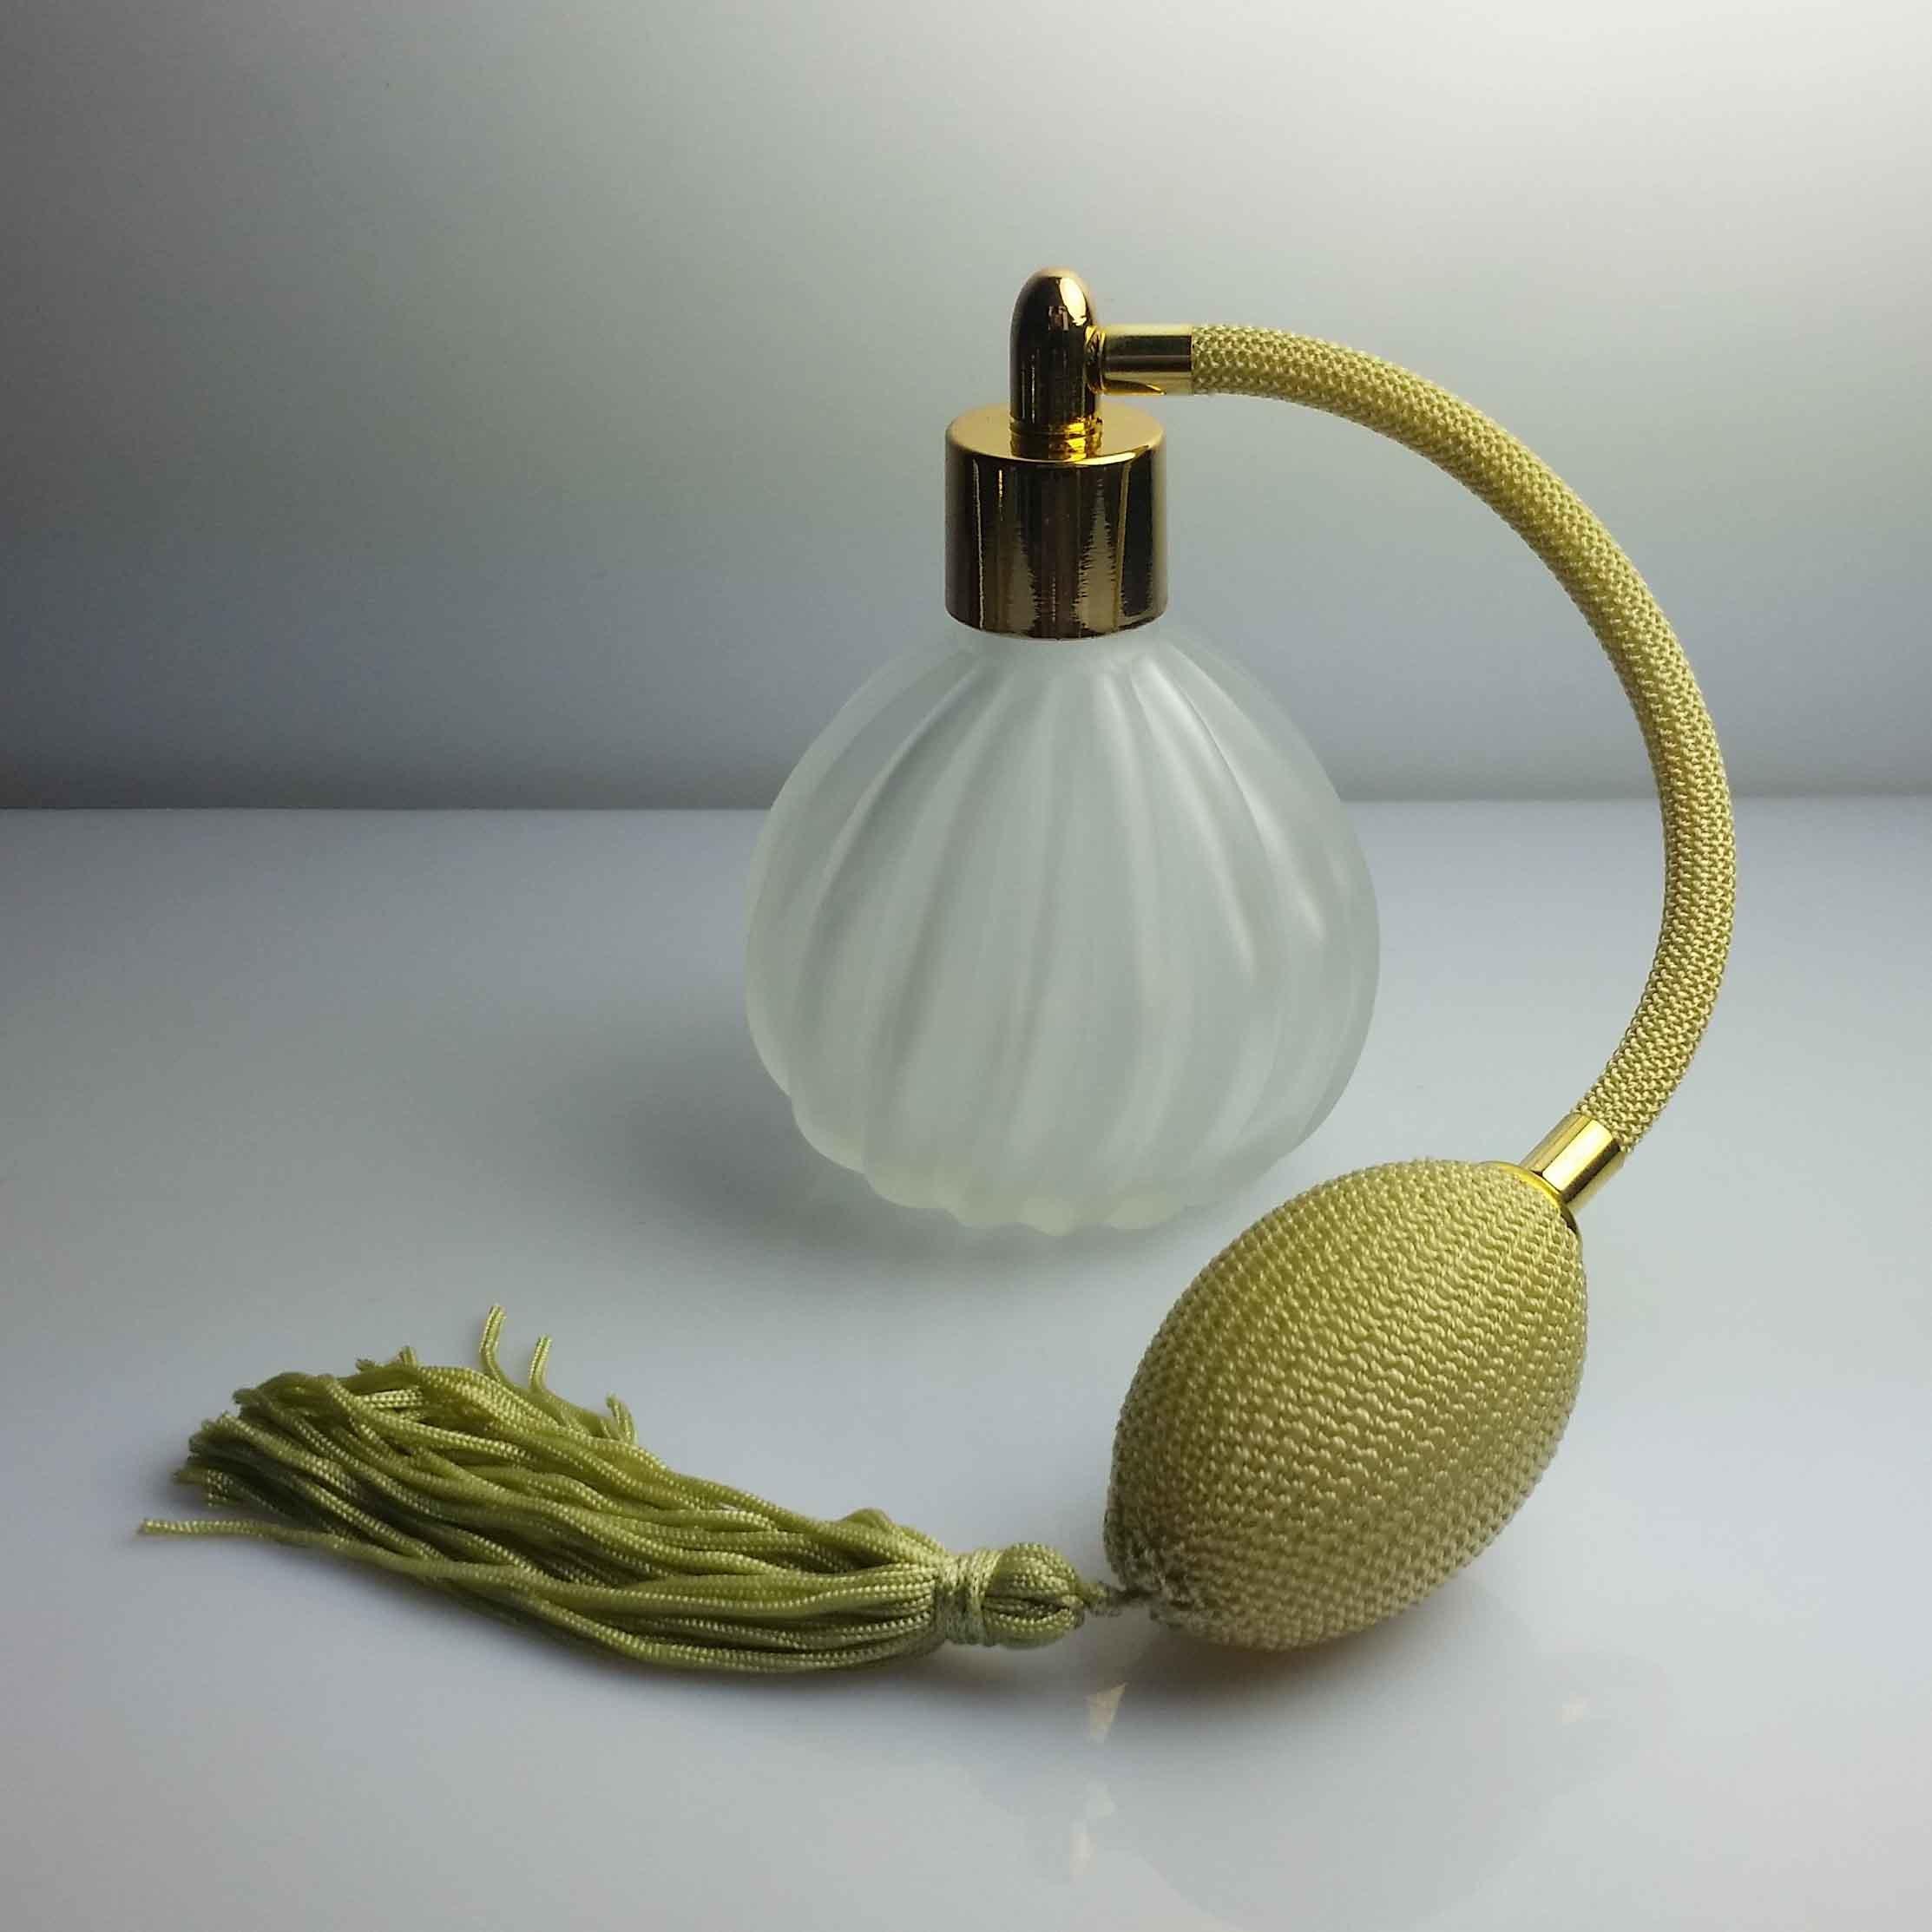 100ml Branded Polishing Crystal Vintage Perfume Bottle